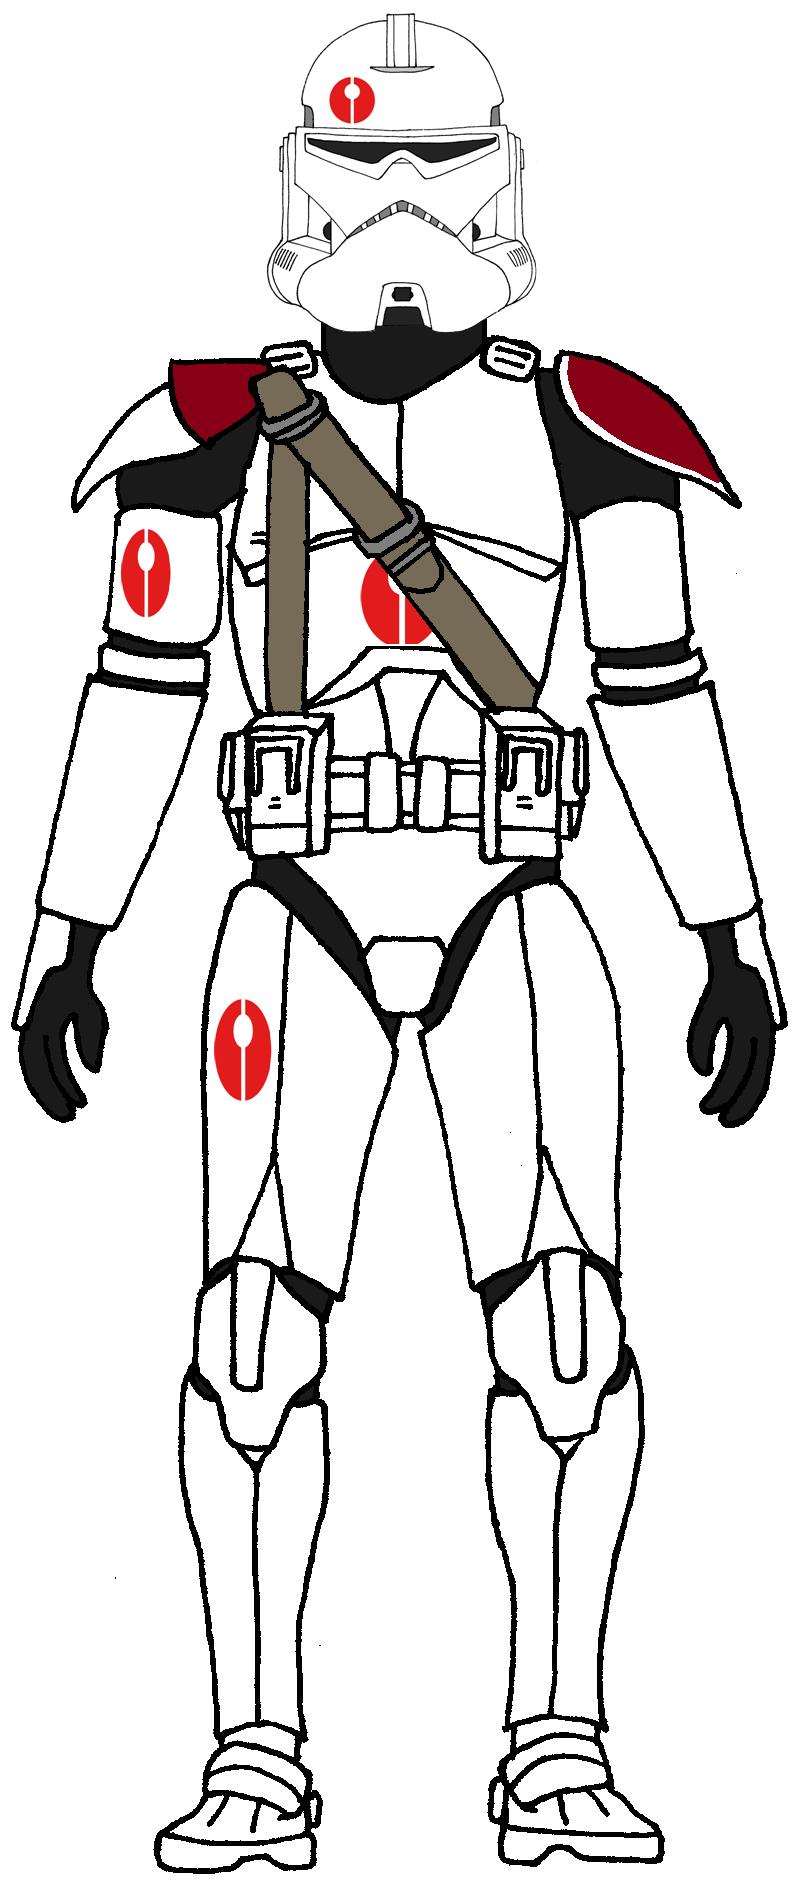 Clone Trooper Neyo S Battalion Star Wars Clone Wars Star Wars Trooper Star Wars Drawings